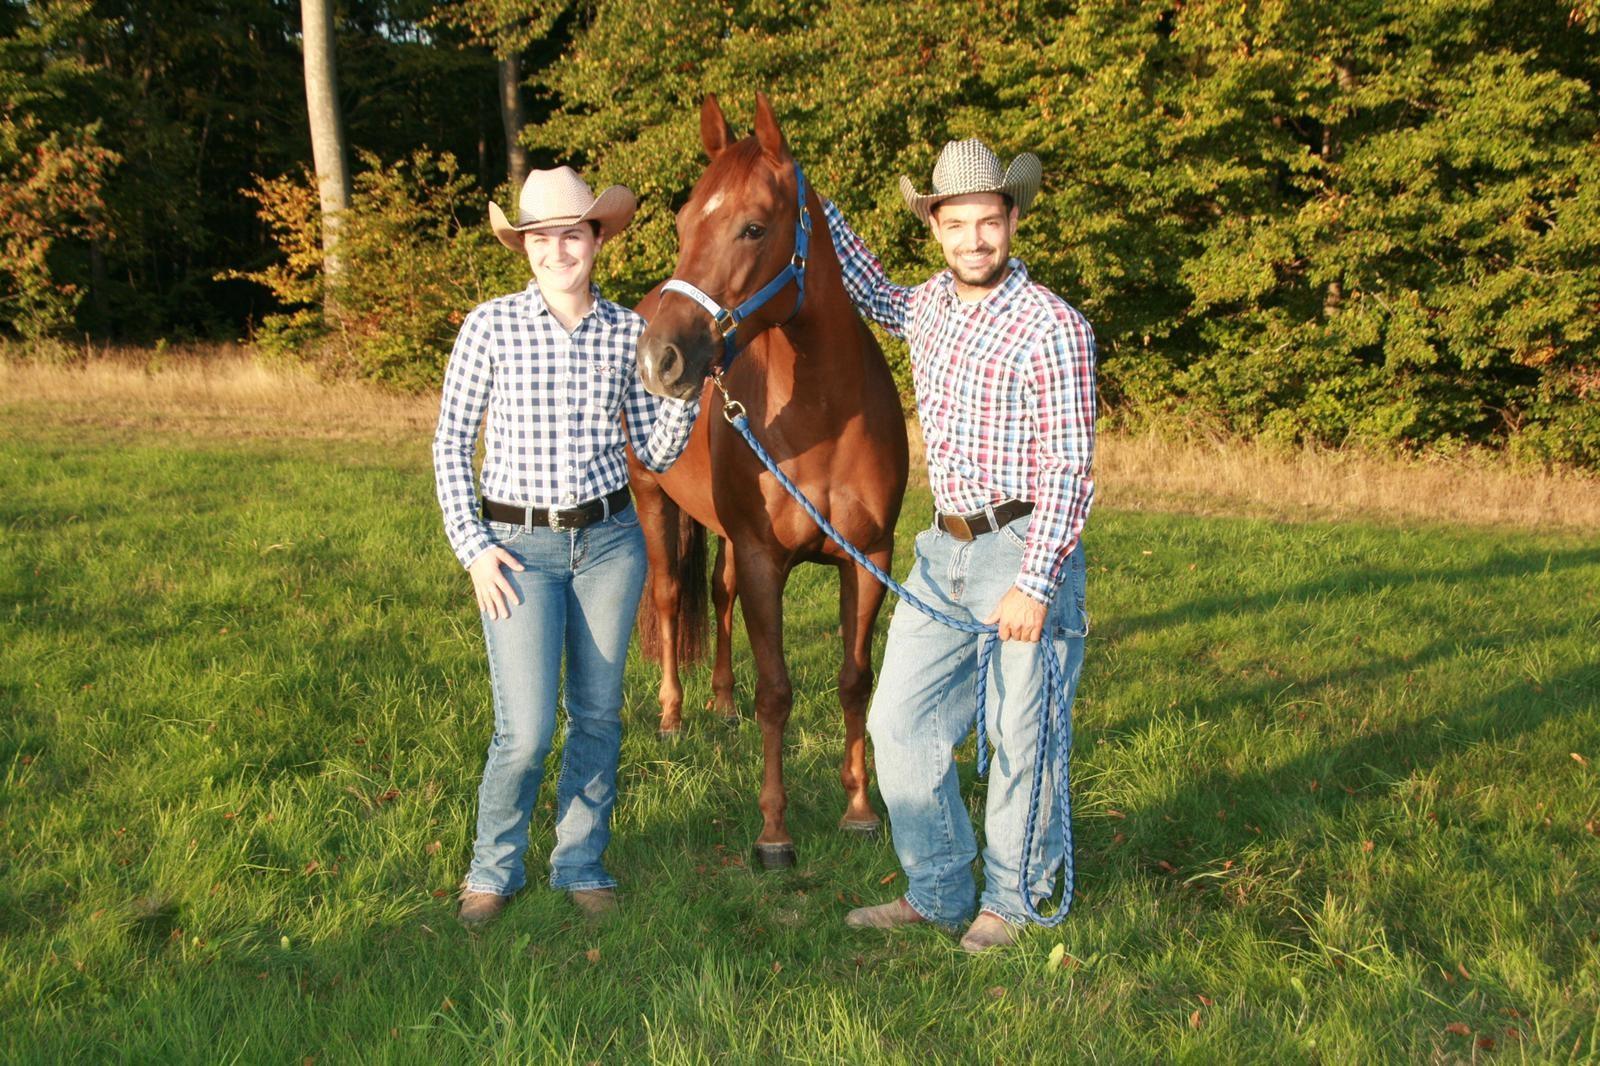 Team Elmers Performance Western riding